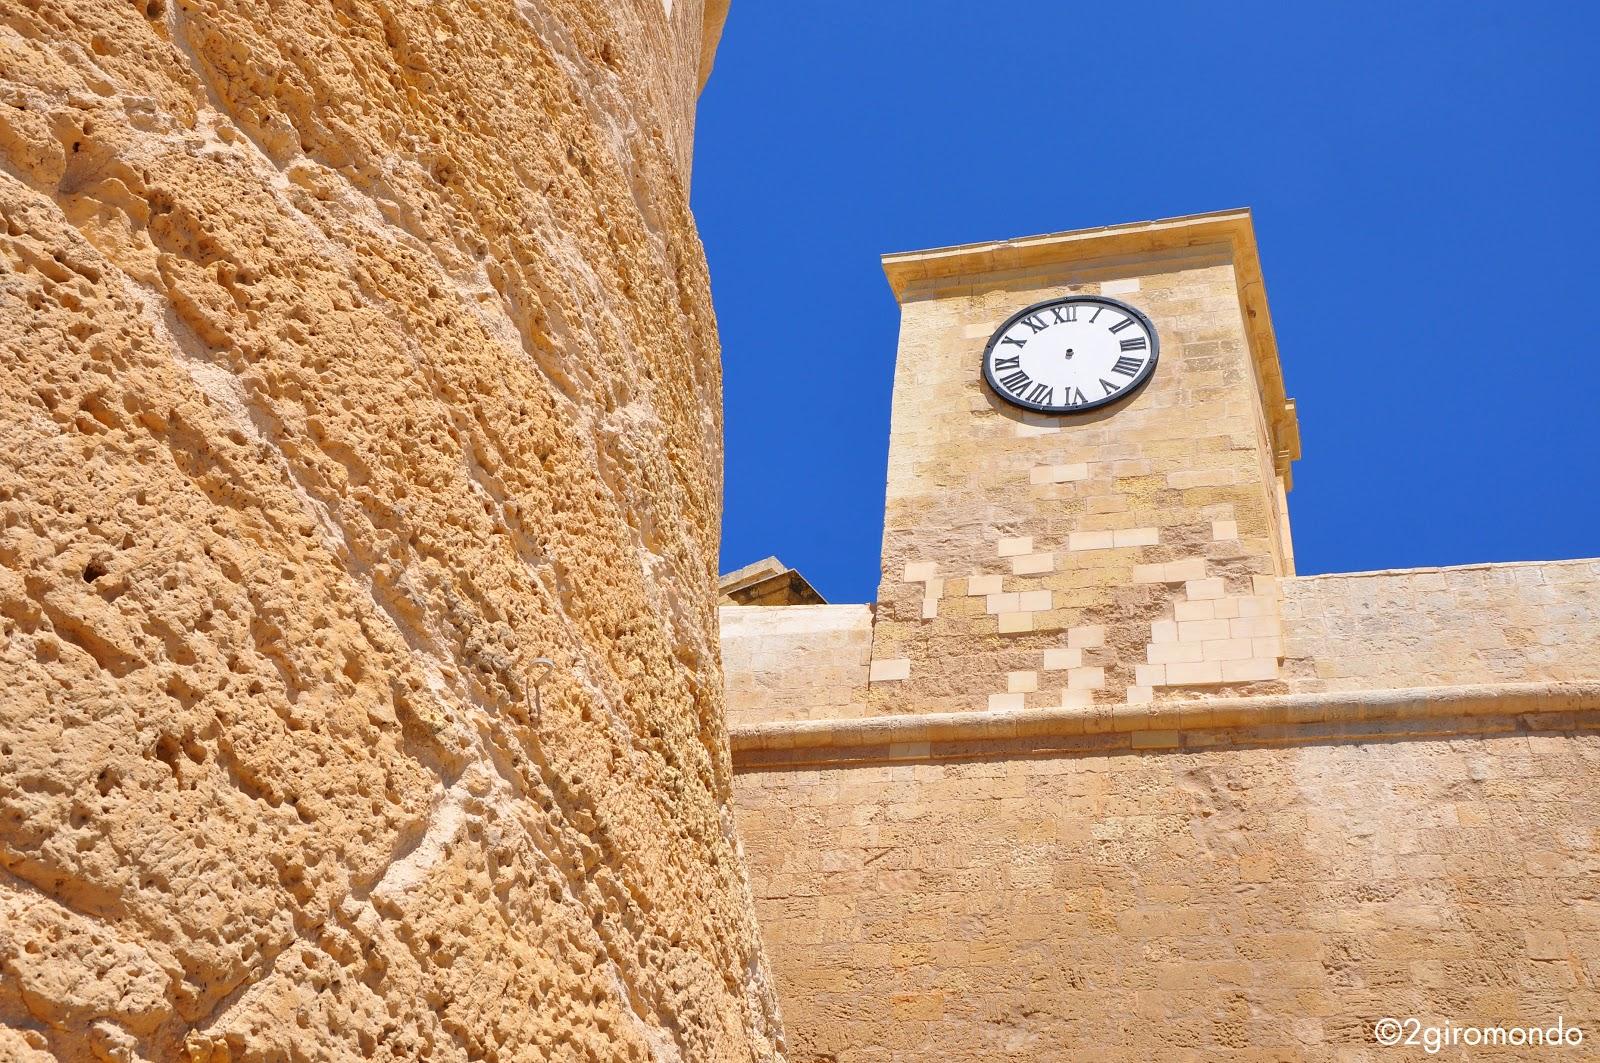 La Cittadella, Gozo